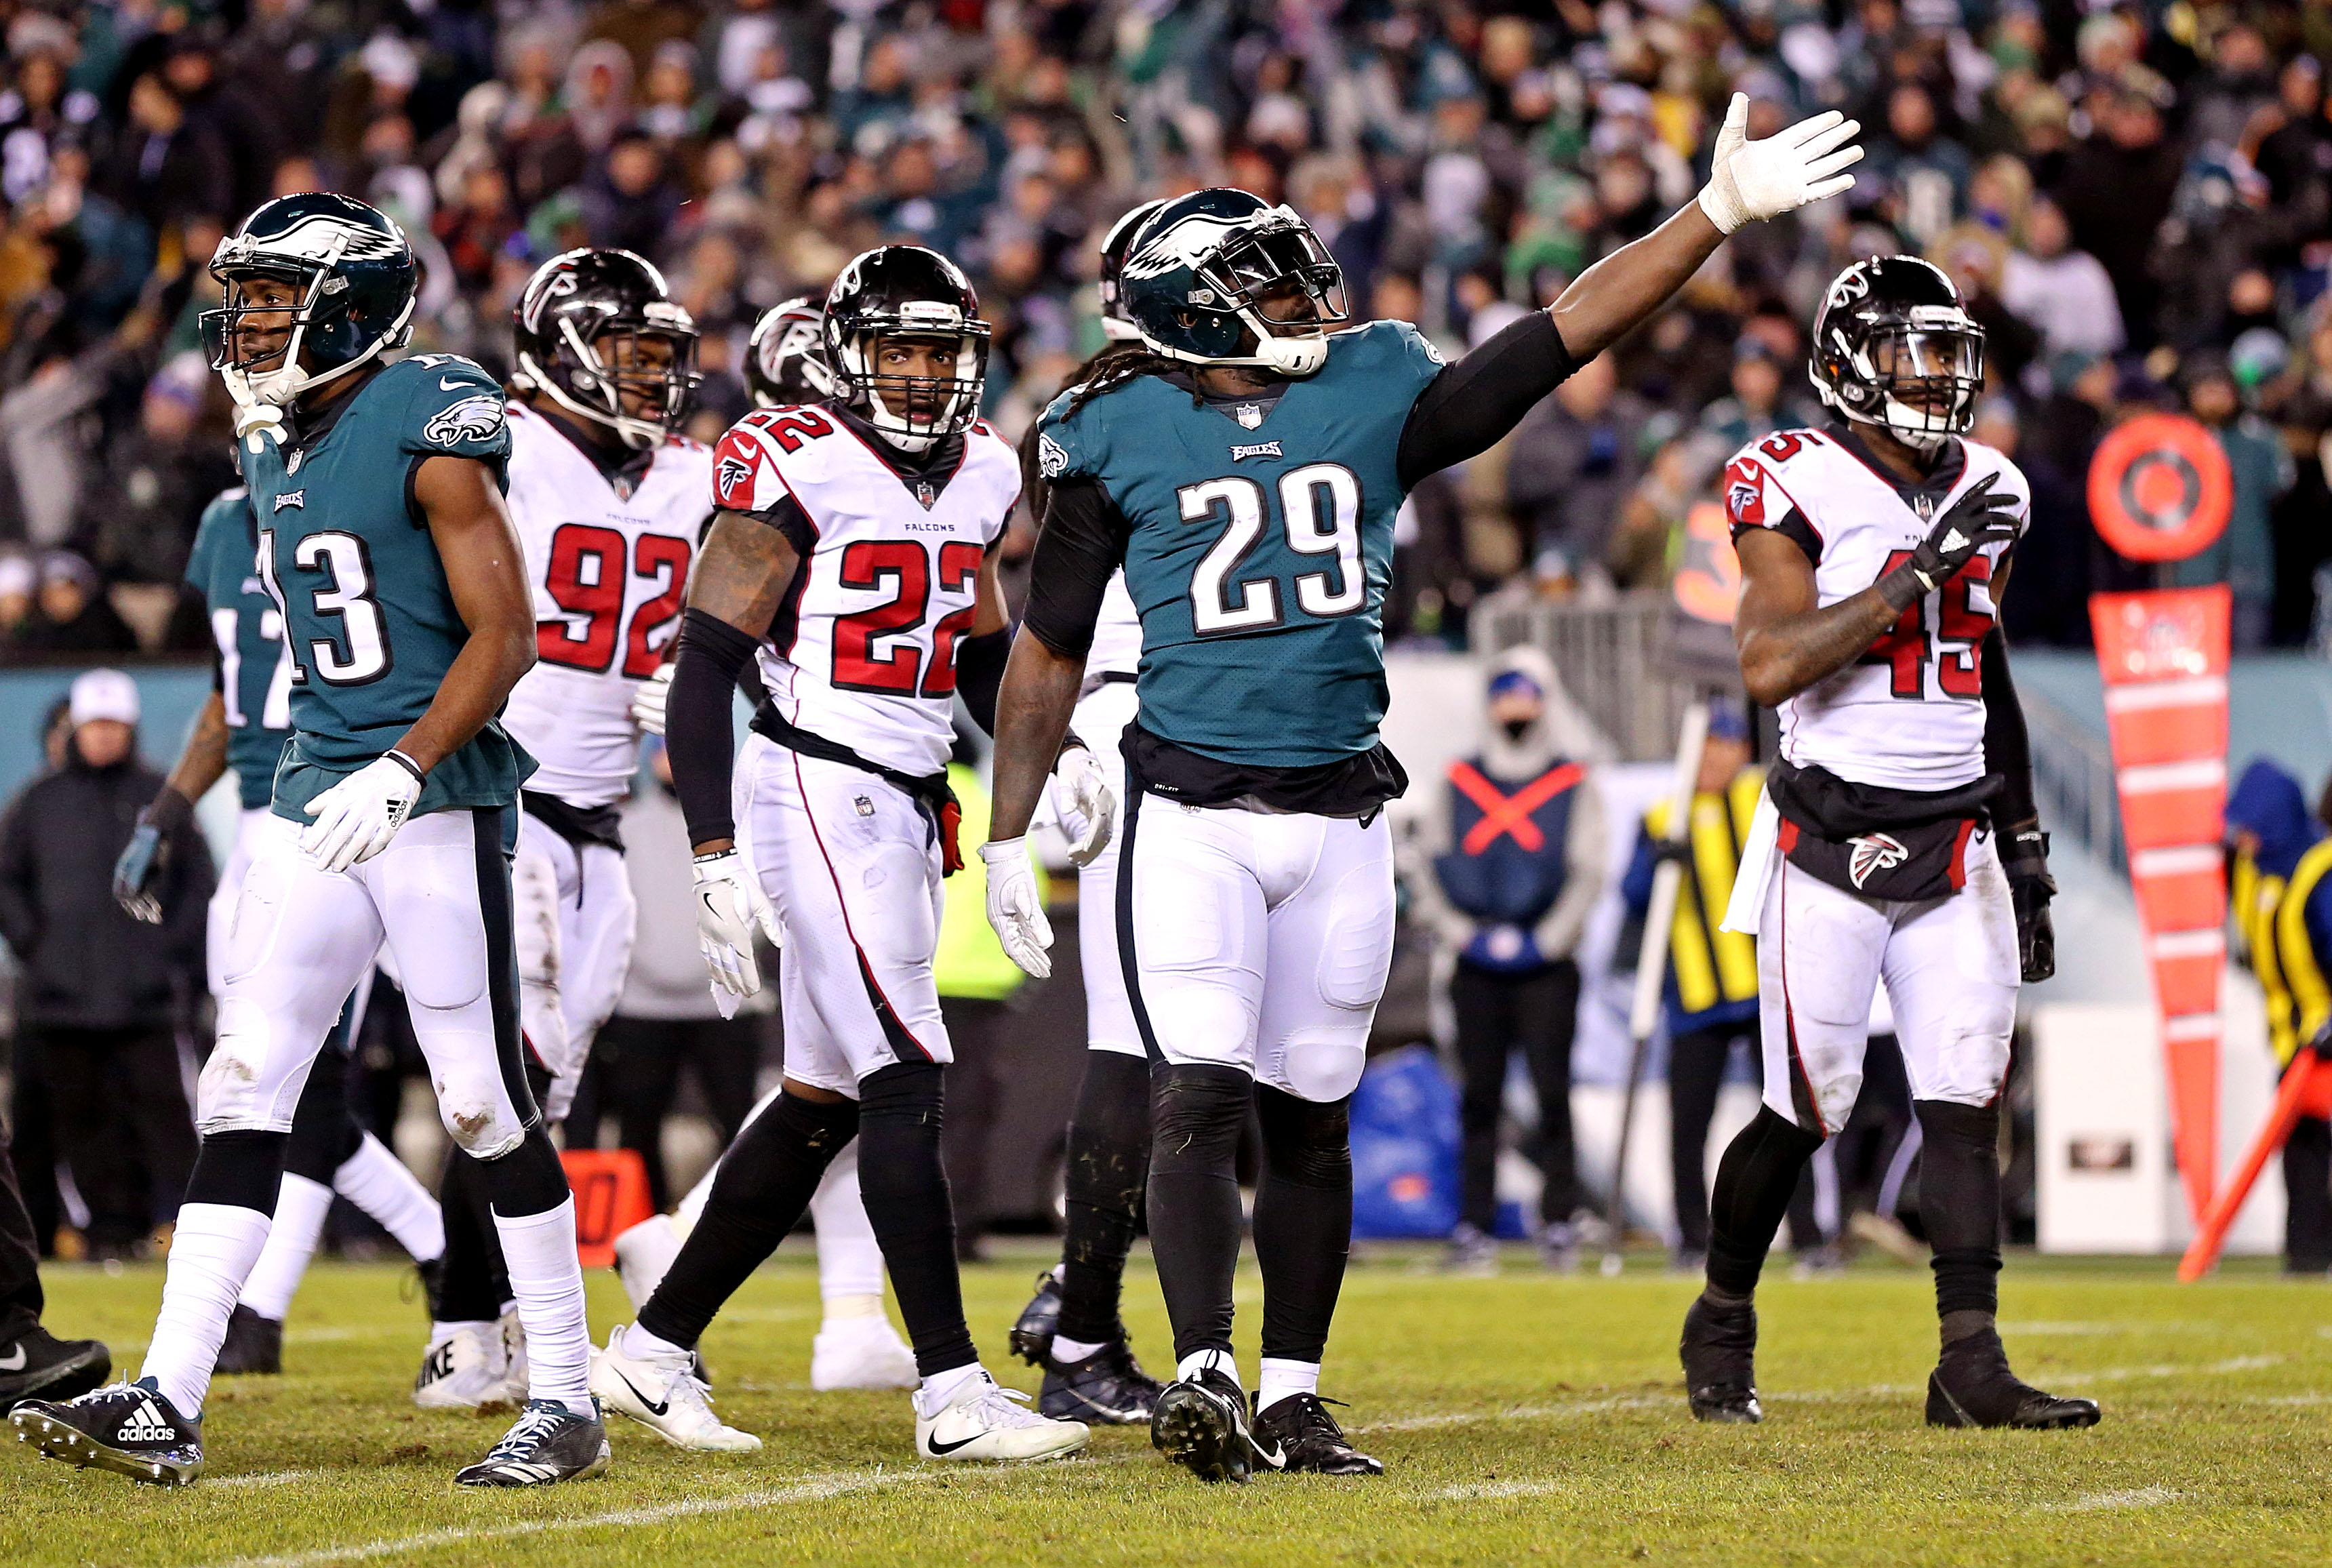 Playoff Divisional Round Wrap-Up: Philadelphia Eagles vs. Atlanta Falcons